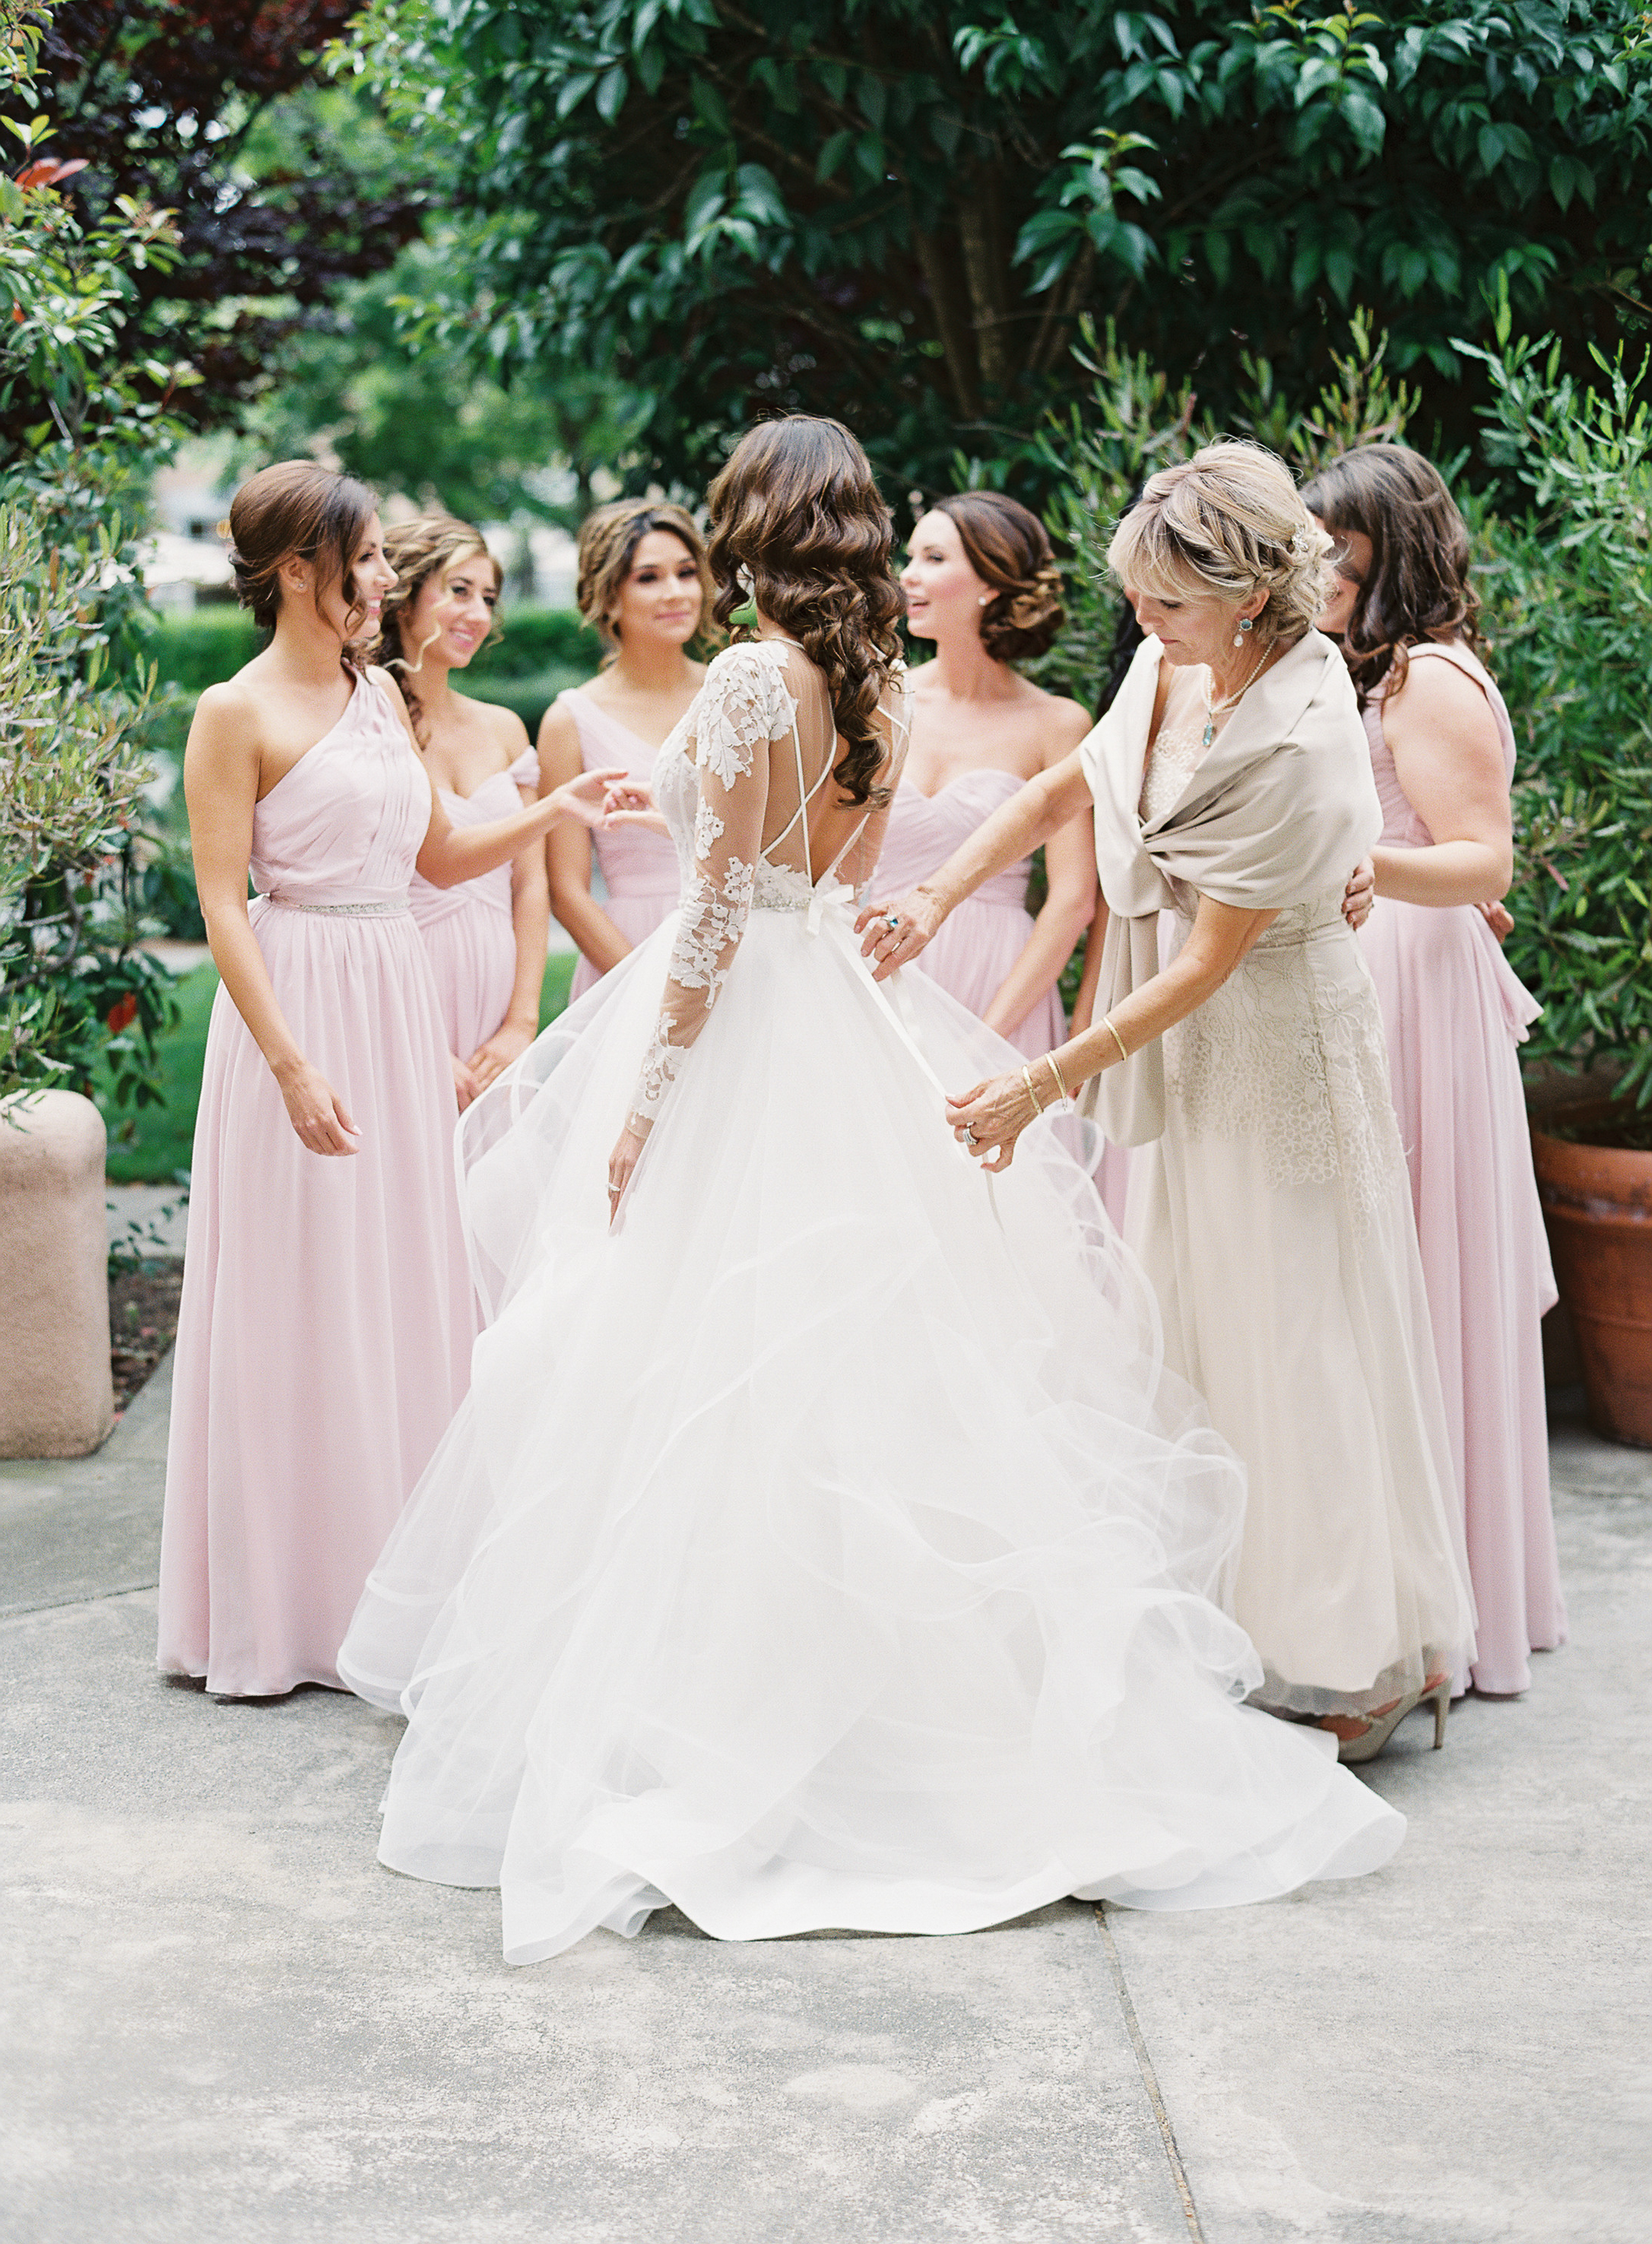 Meghan Mehan Photography | Fine Art Film Wedding Photographer | California | San Francisco | Napa | Sonoma | Santa Barbara | Big Sur | Destination Wedding Photographer 008.jpg